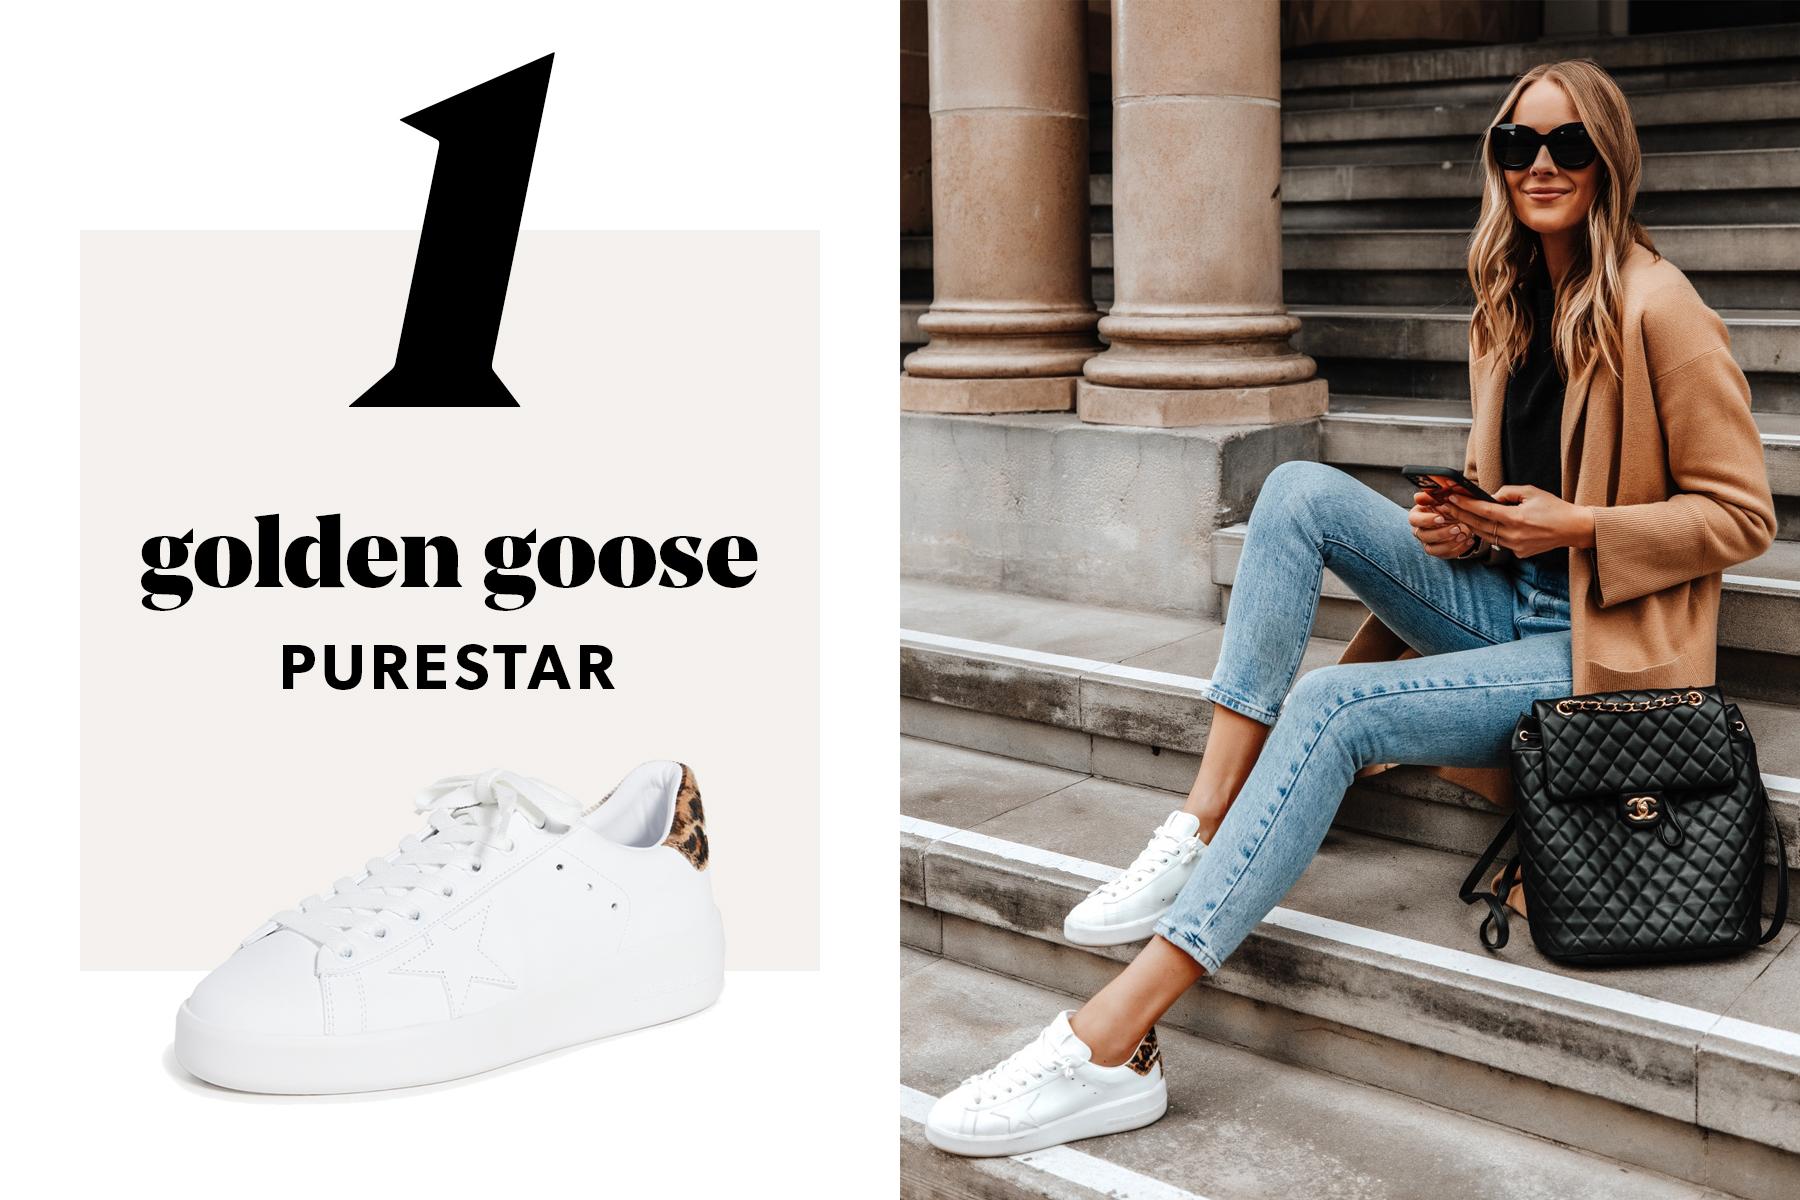 fashion jackson wearing golden goose purestars sneakers